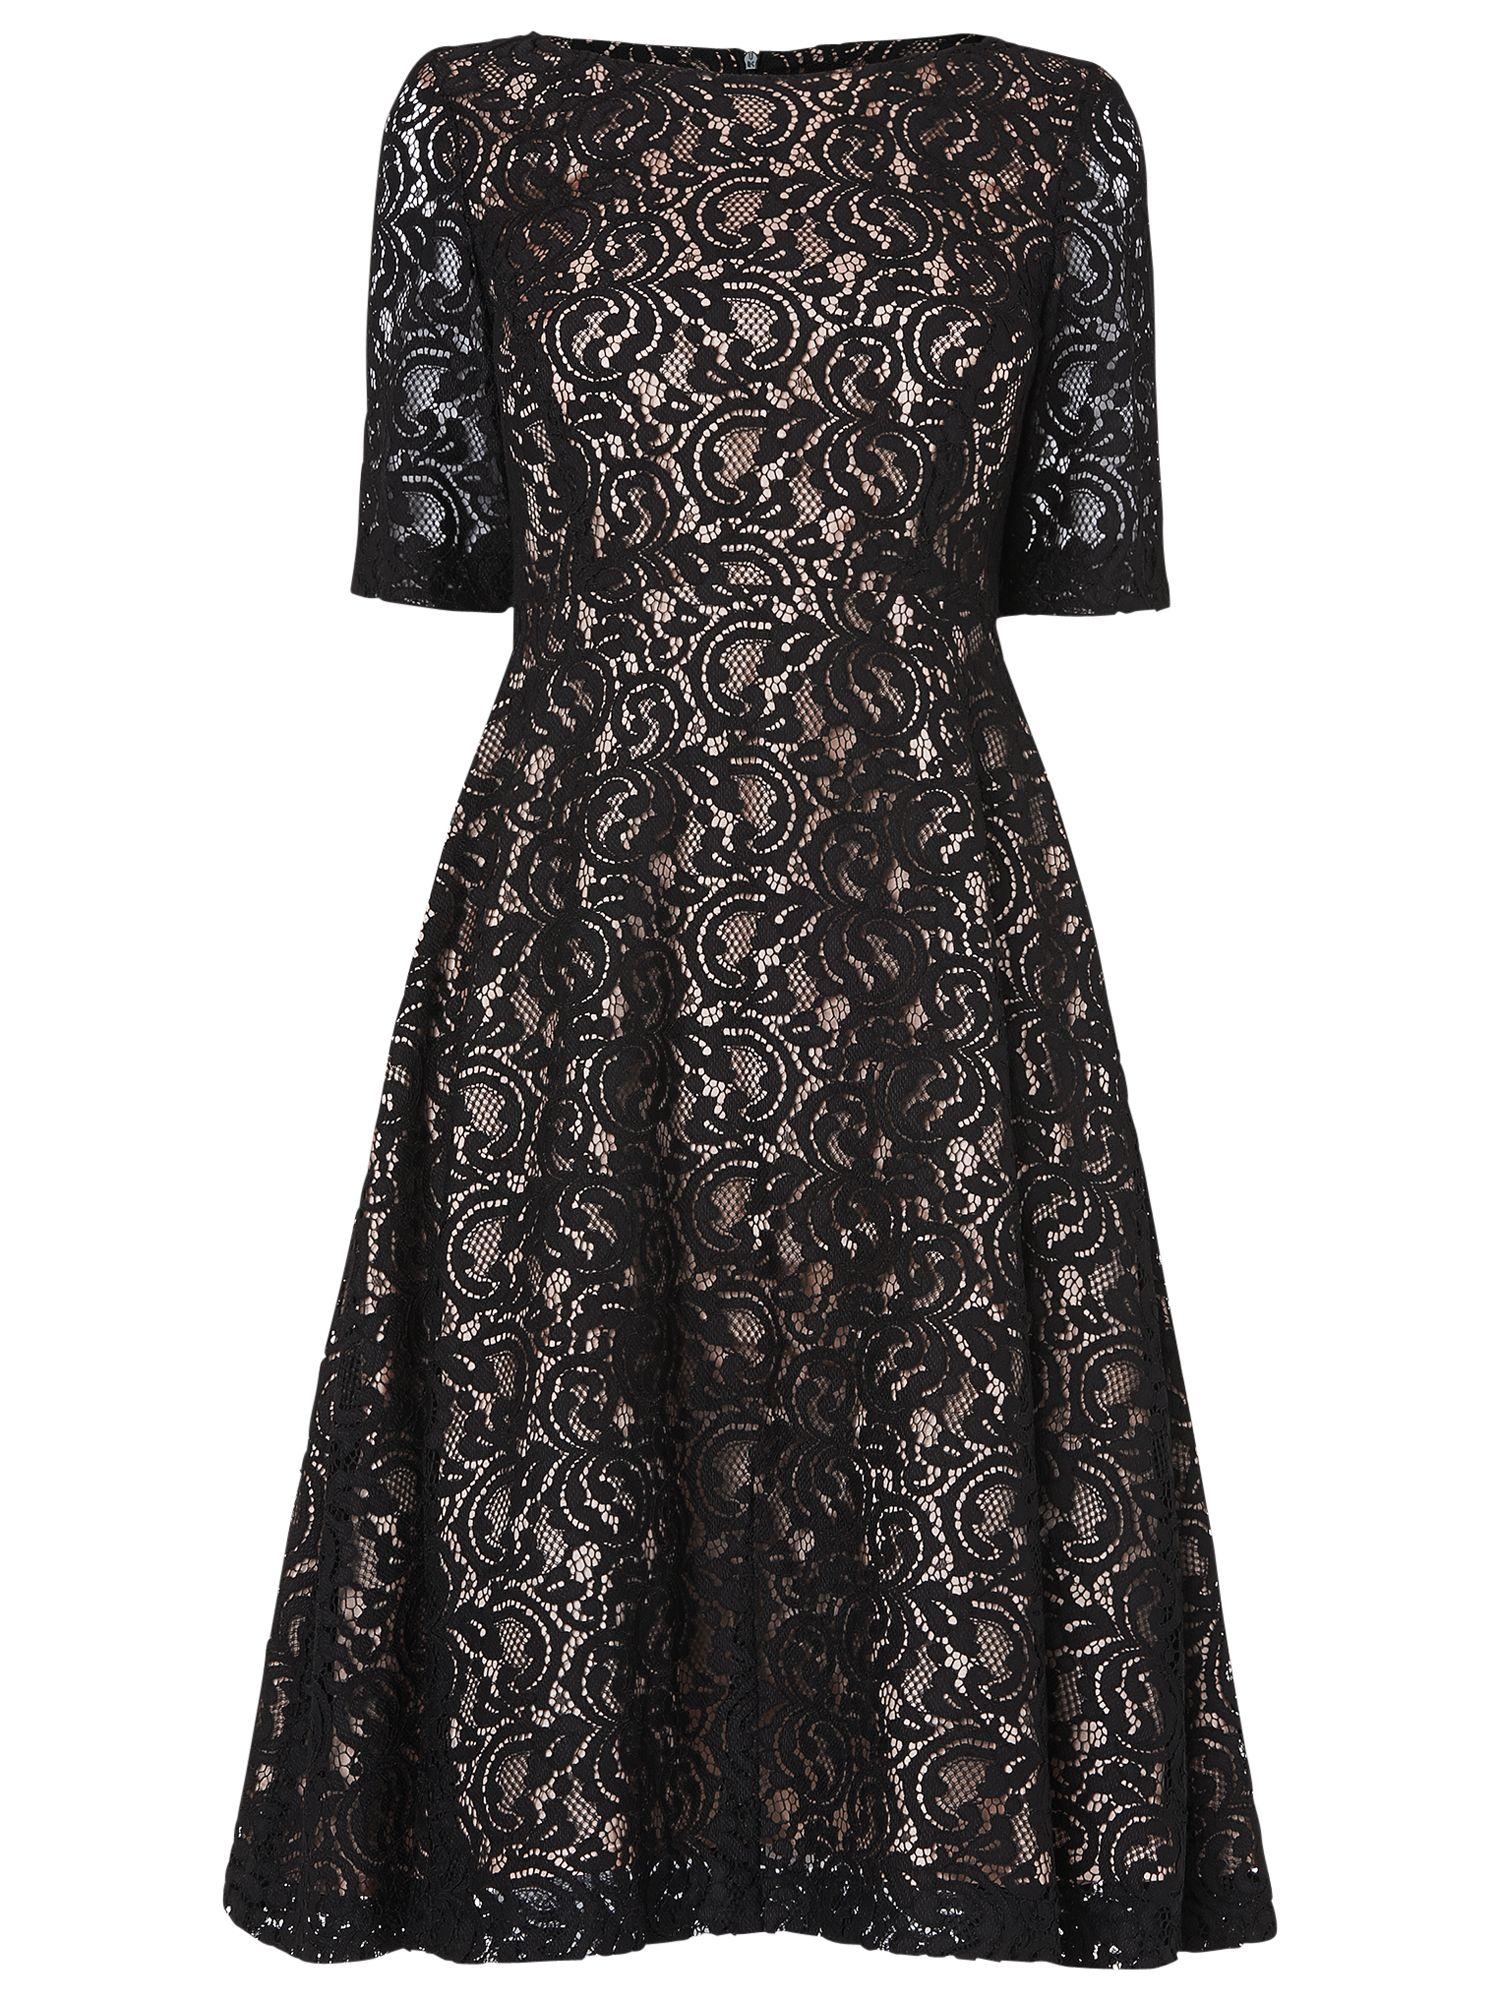 Phase Eight Louanna Lace Dress, Black